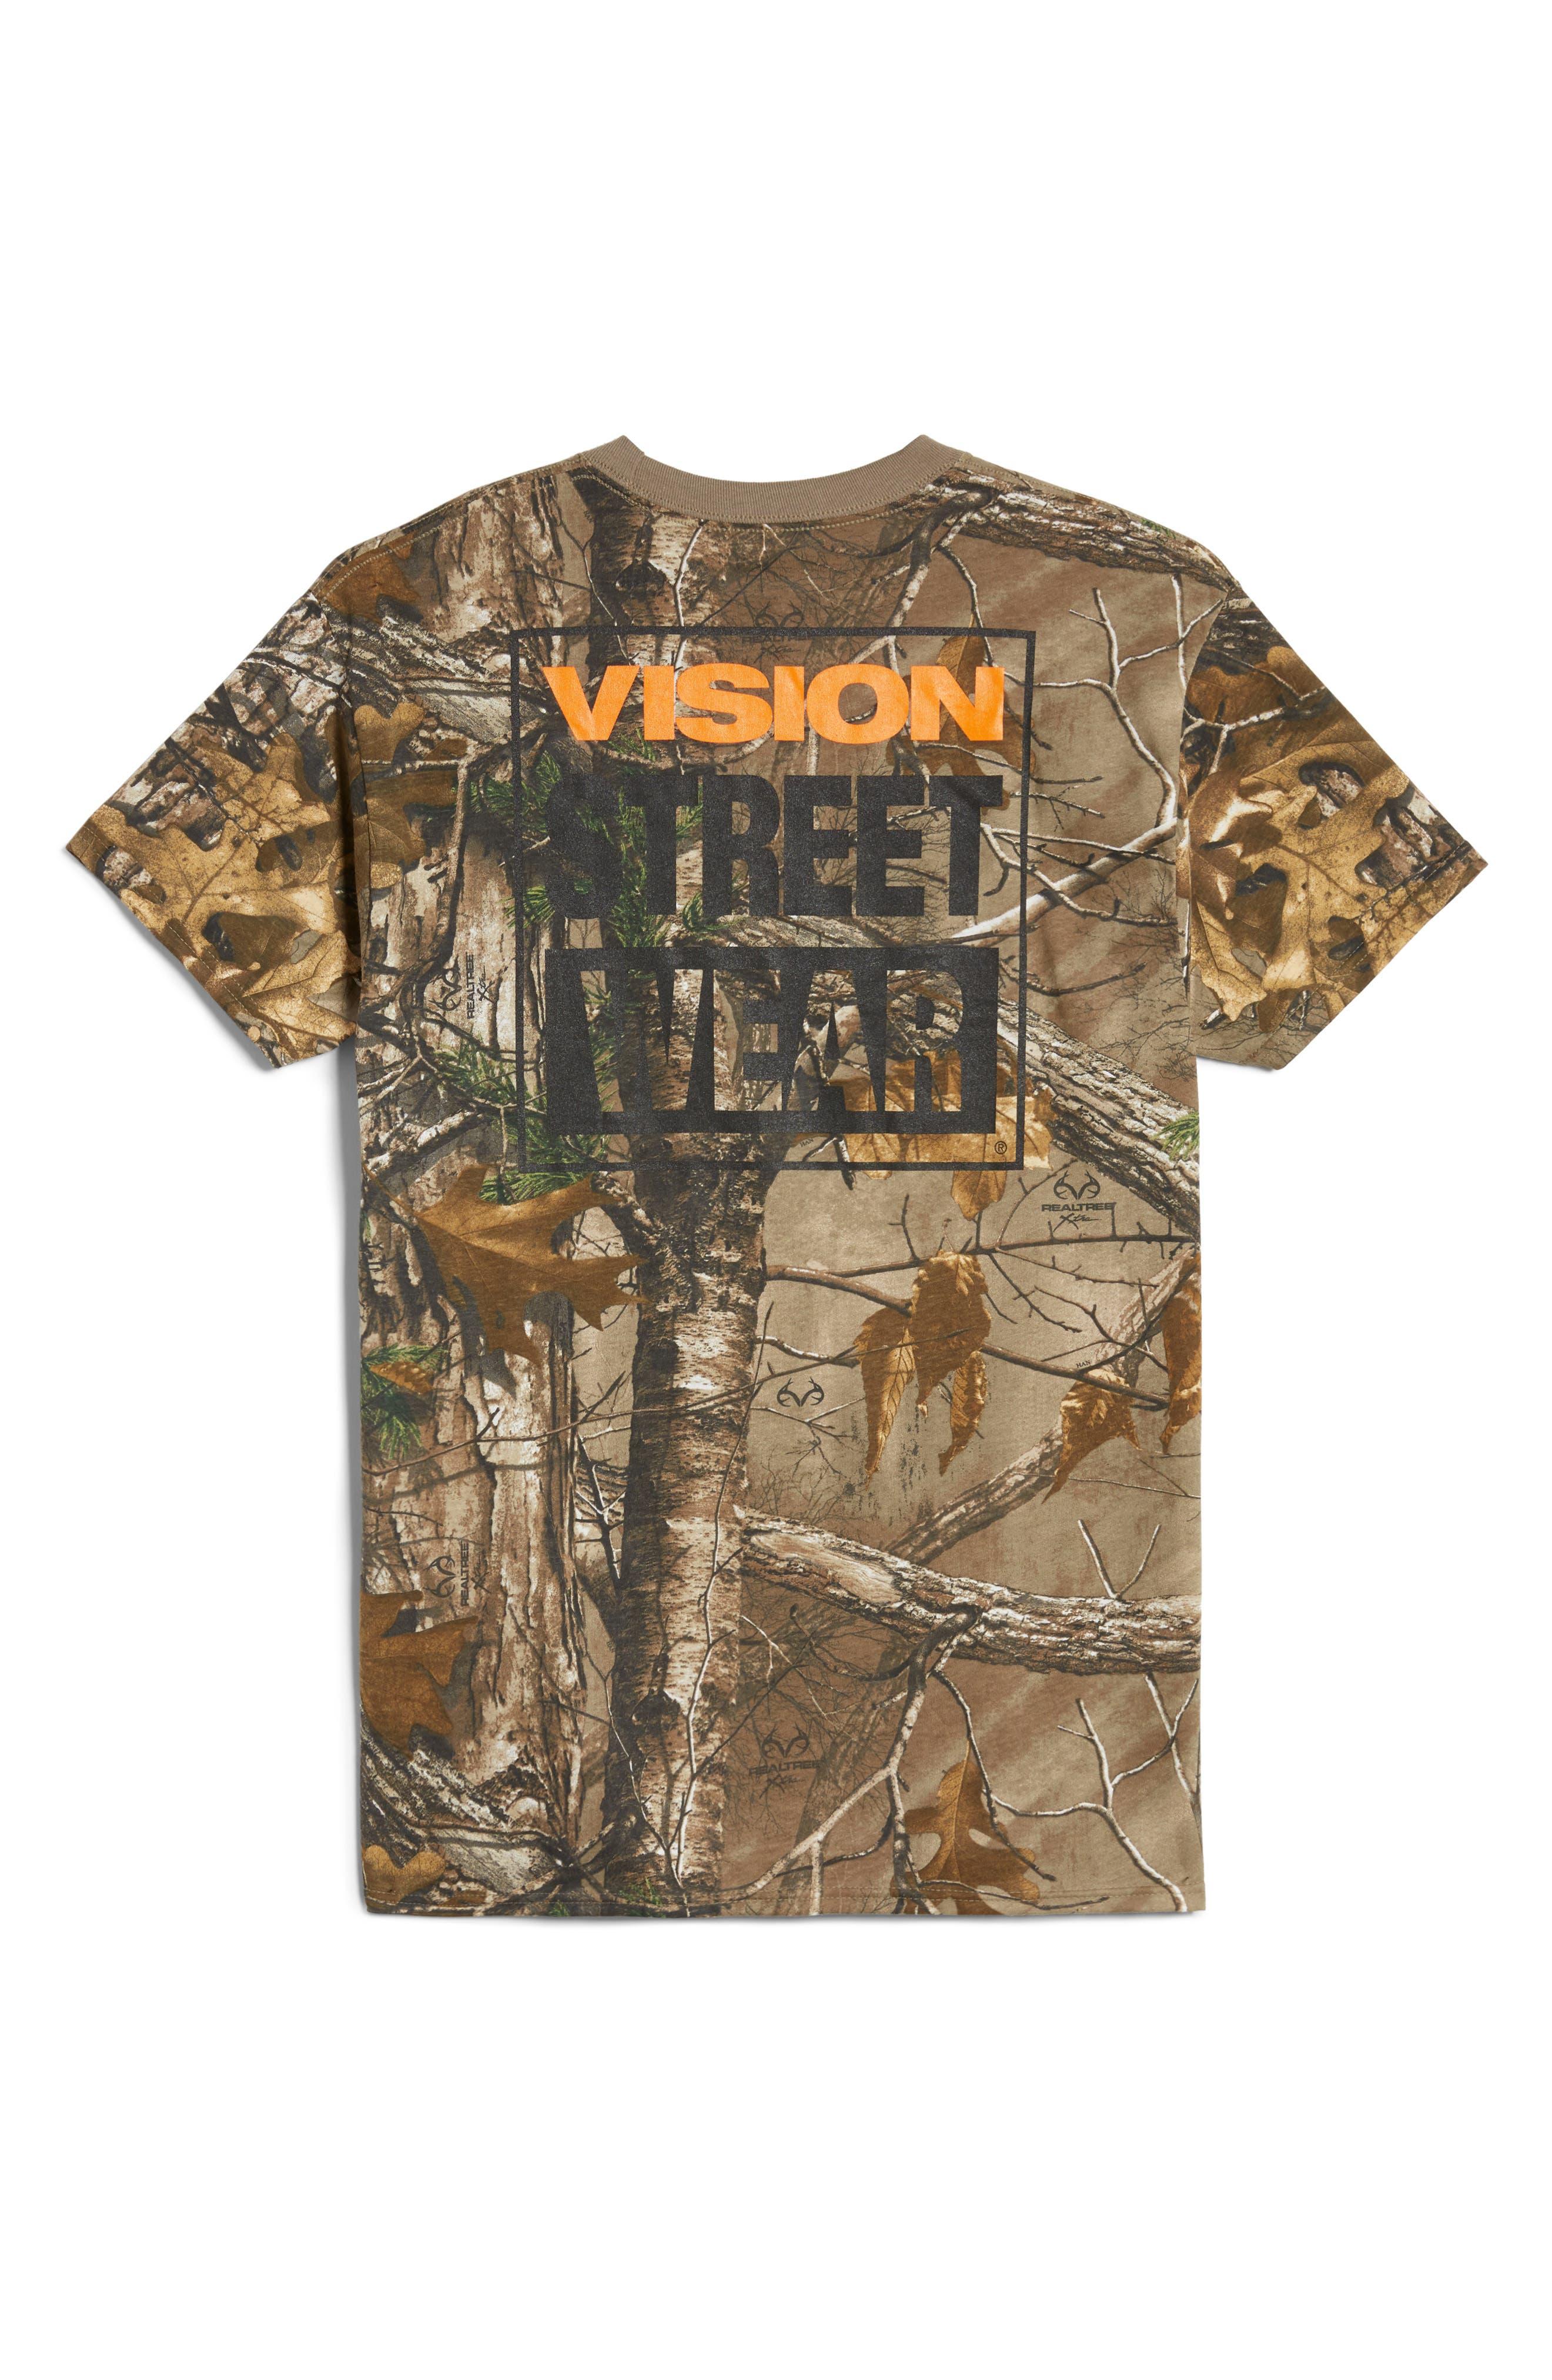 Vision Street Wear Camo 2 T-Shirt